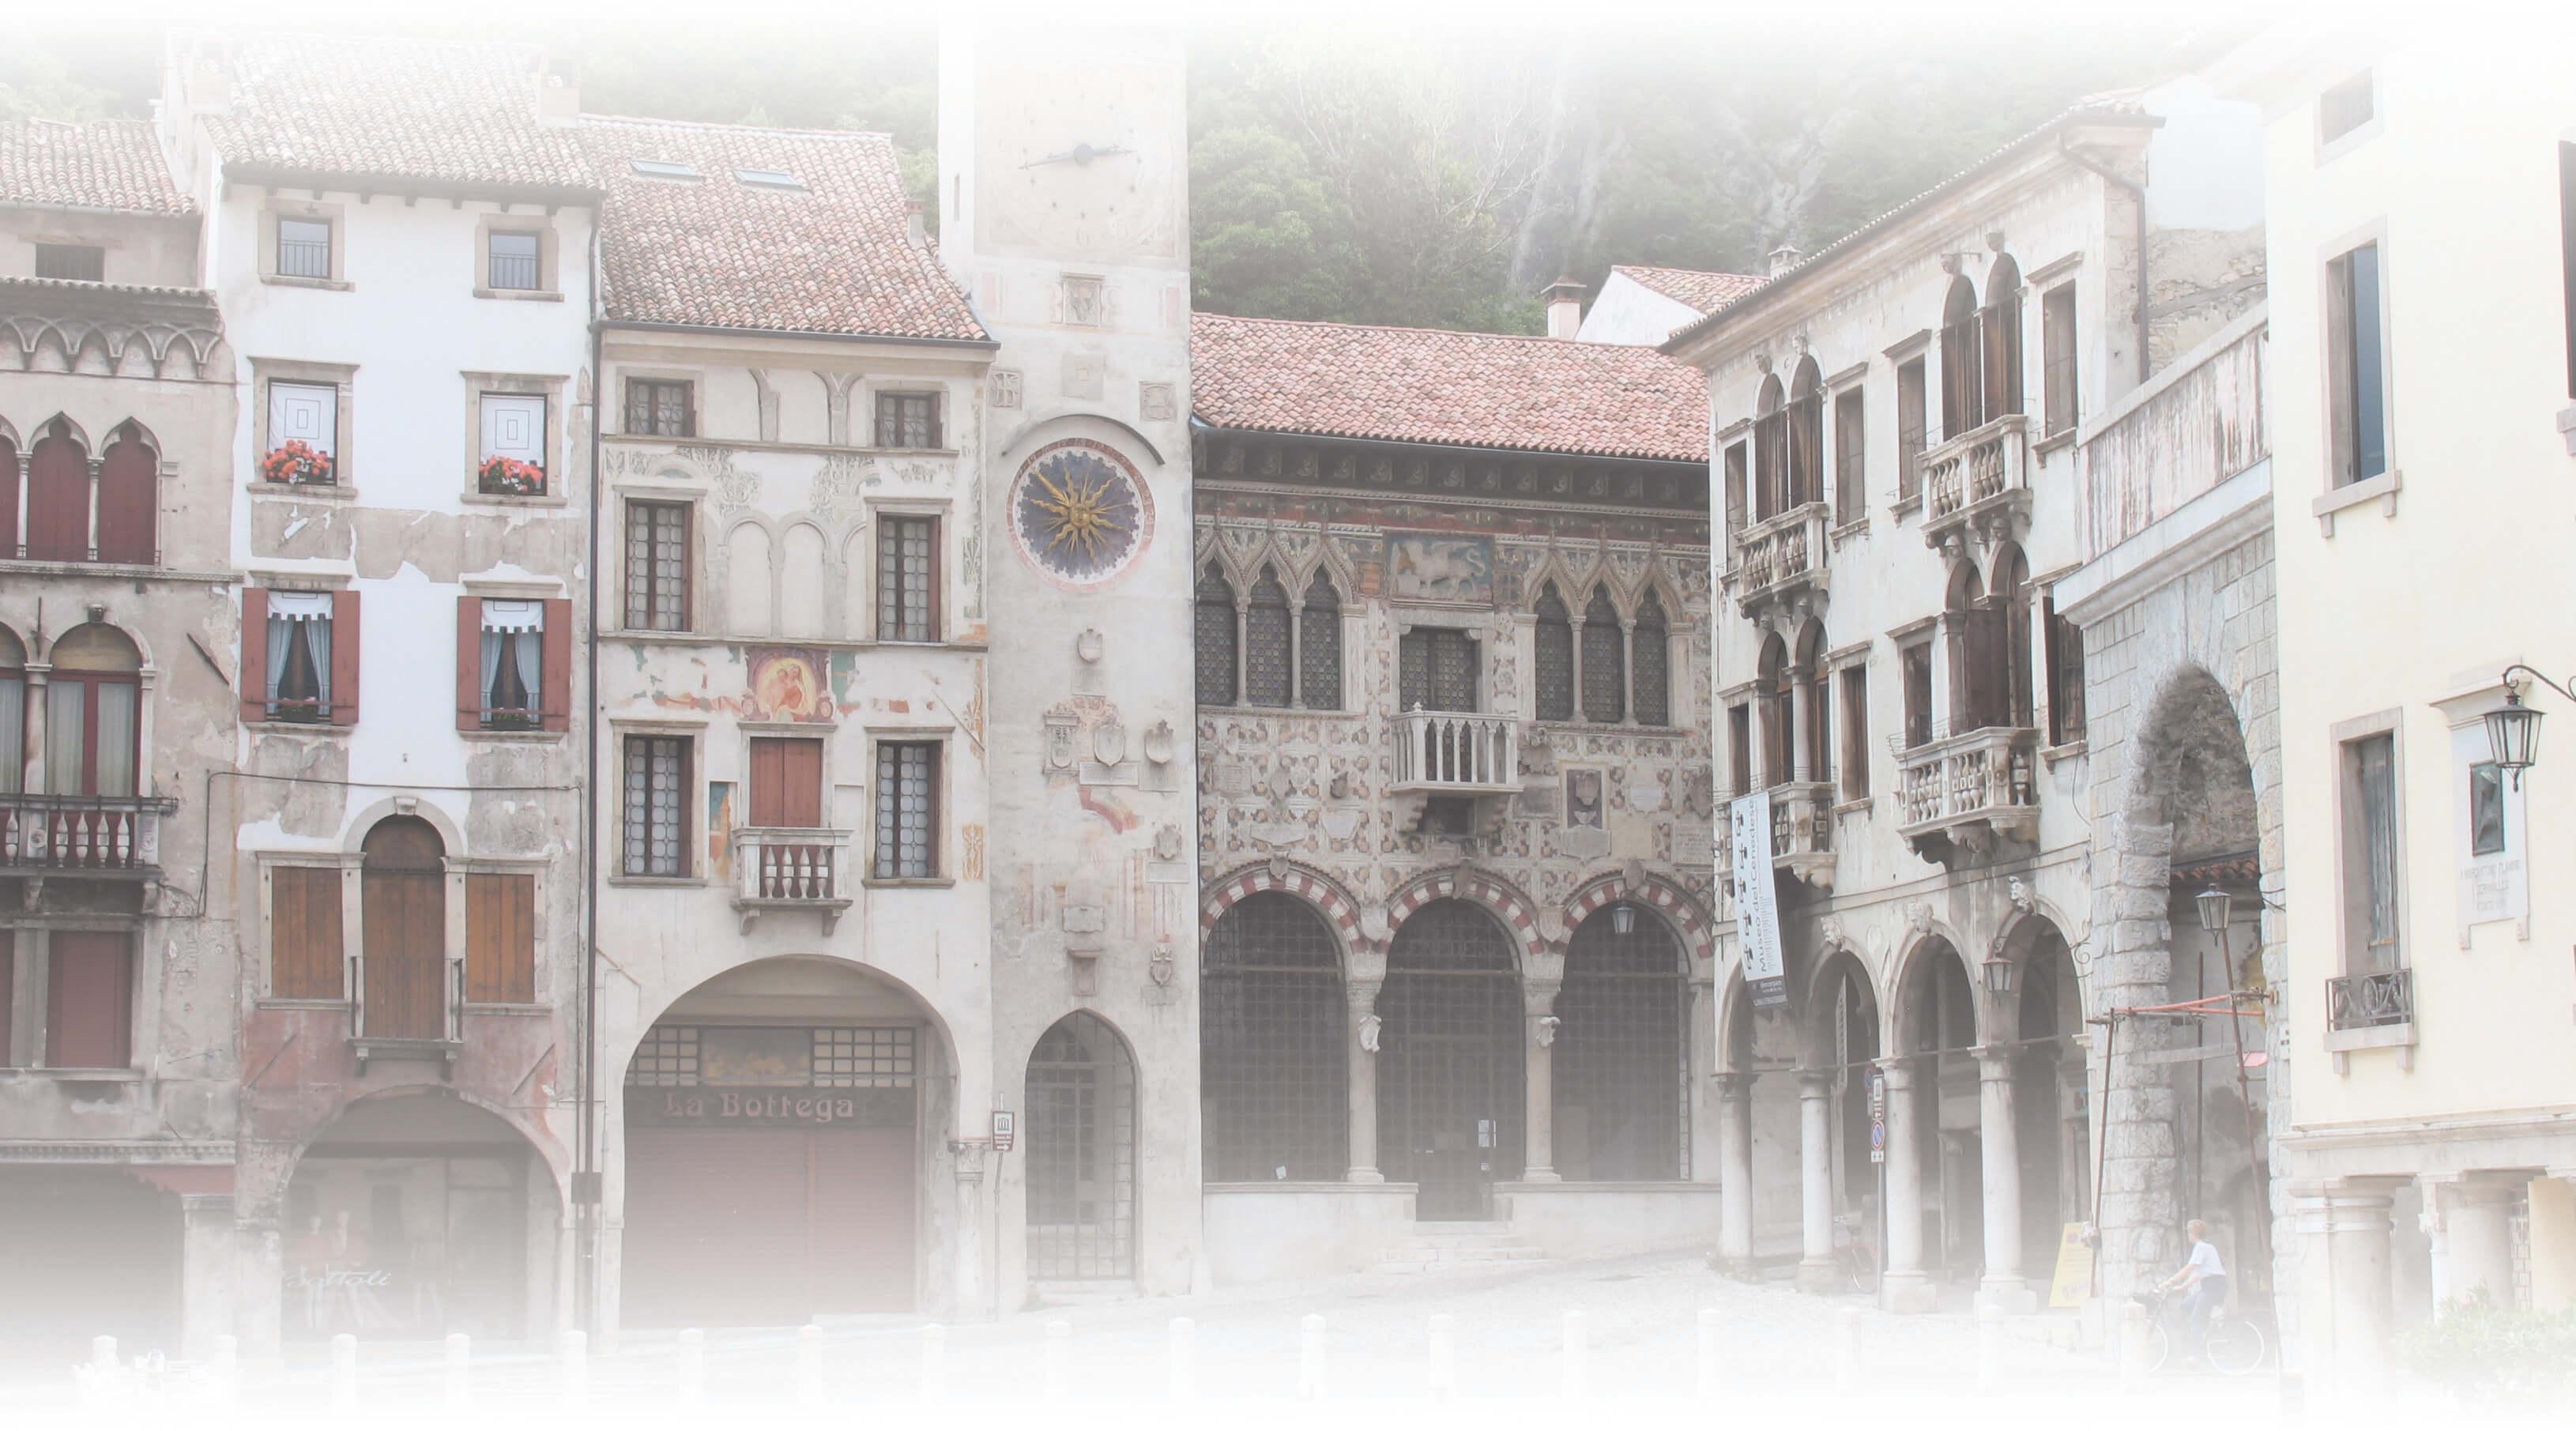 piazza serravalle-2